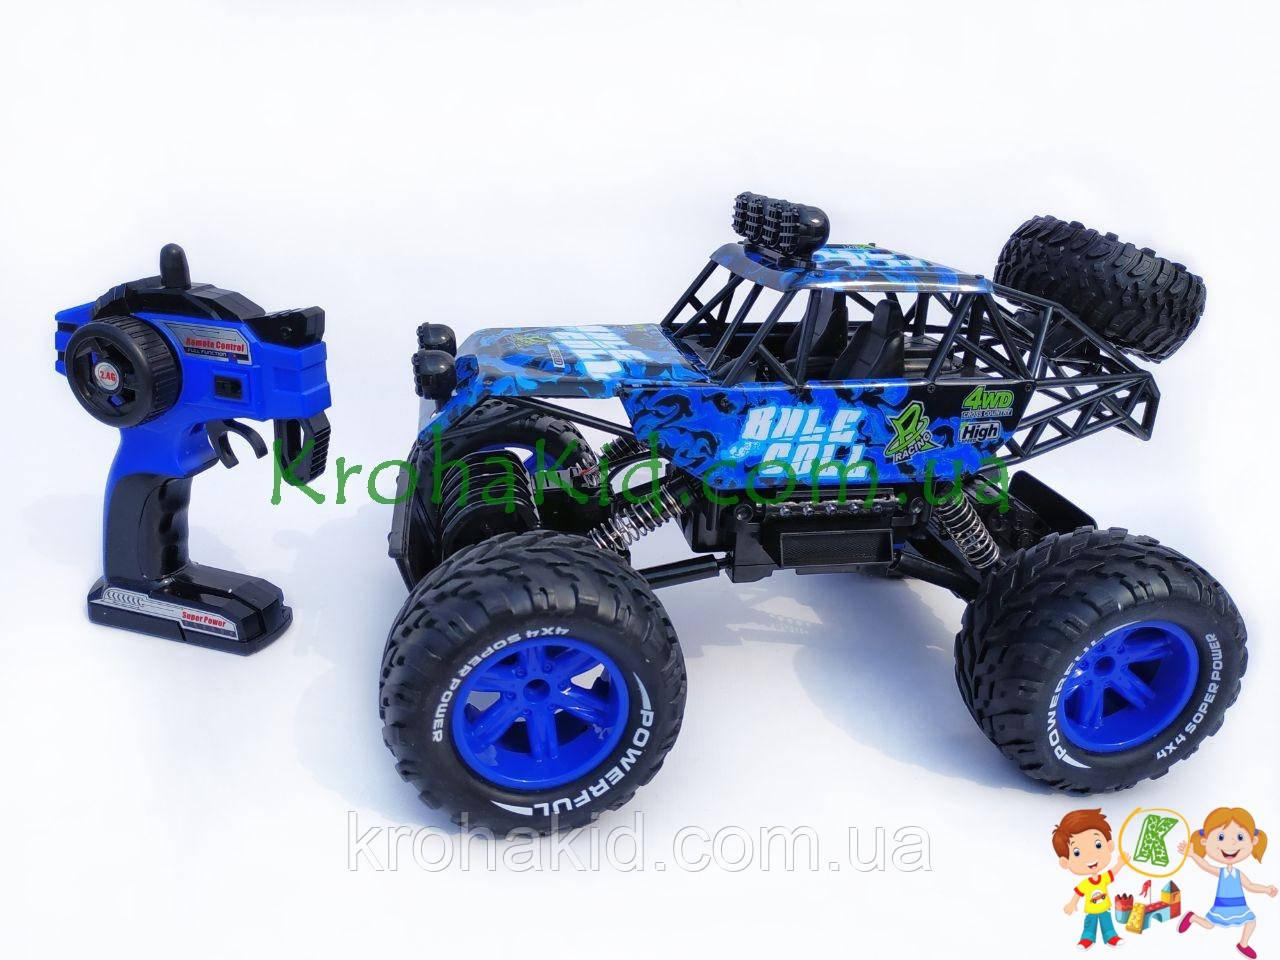 Машина на радиоуправлении (р/у) вездеход / багги 689-351 4WD OF ROAD аккумулятор 6V, масштаб 1:10 (синий)